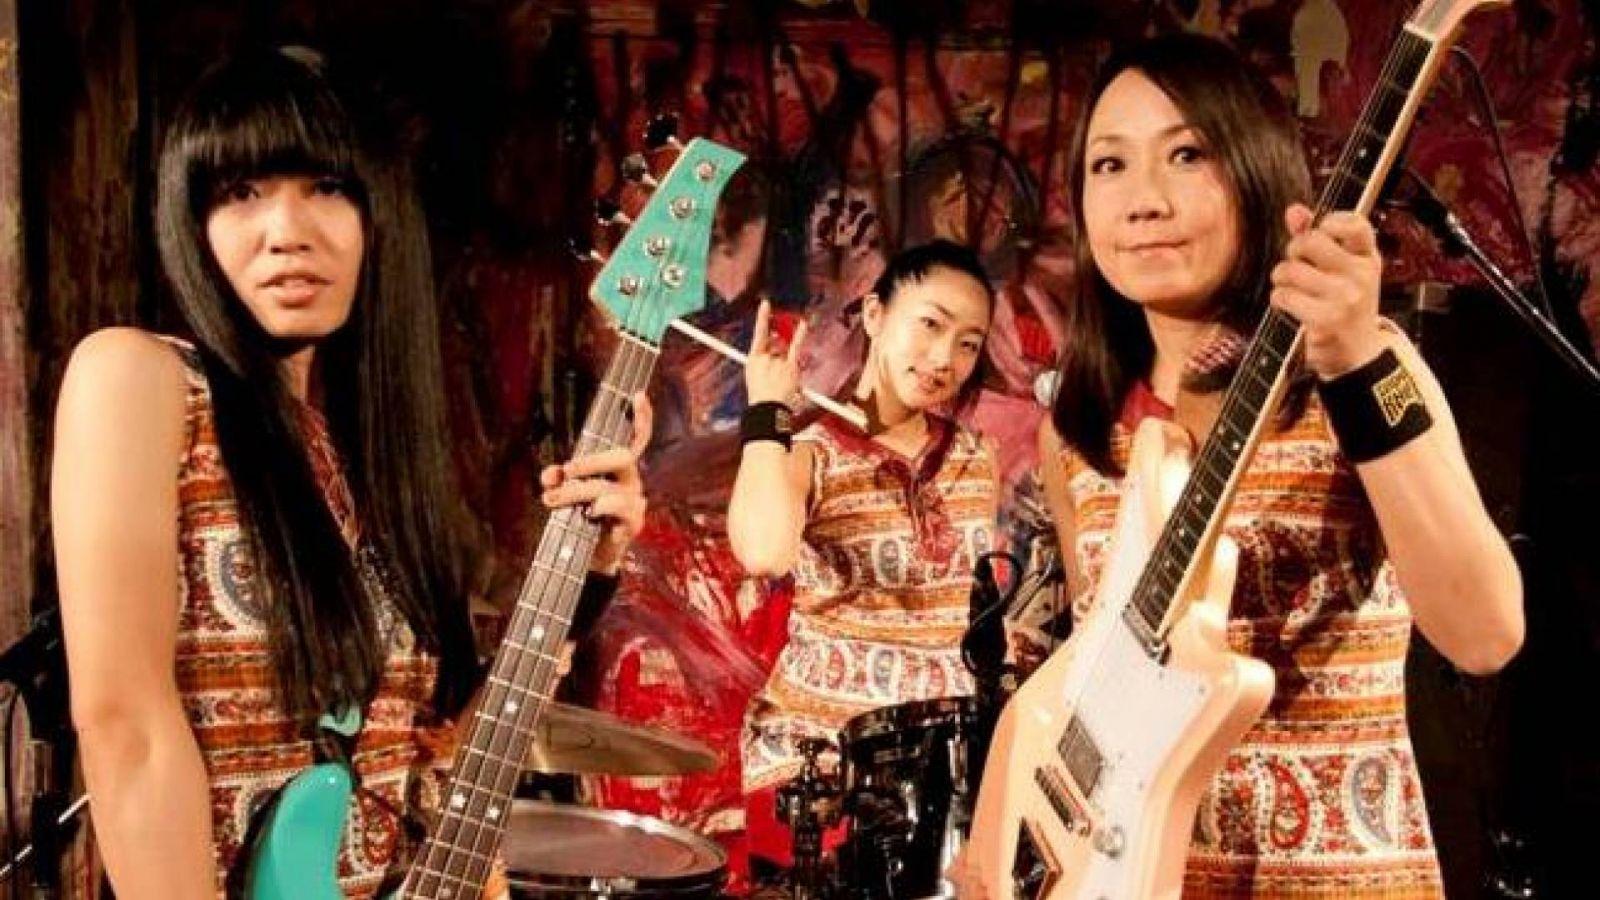 Les chansons pop de Shonen Knife © Shonen Knife